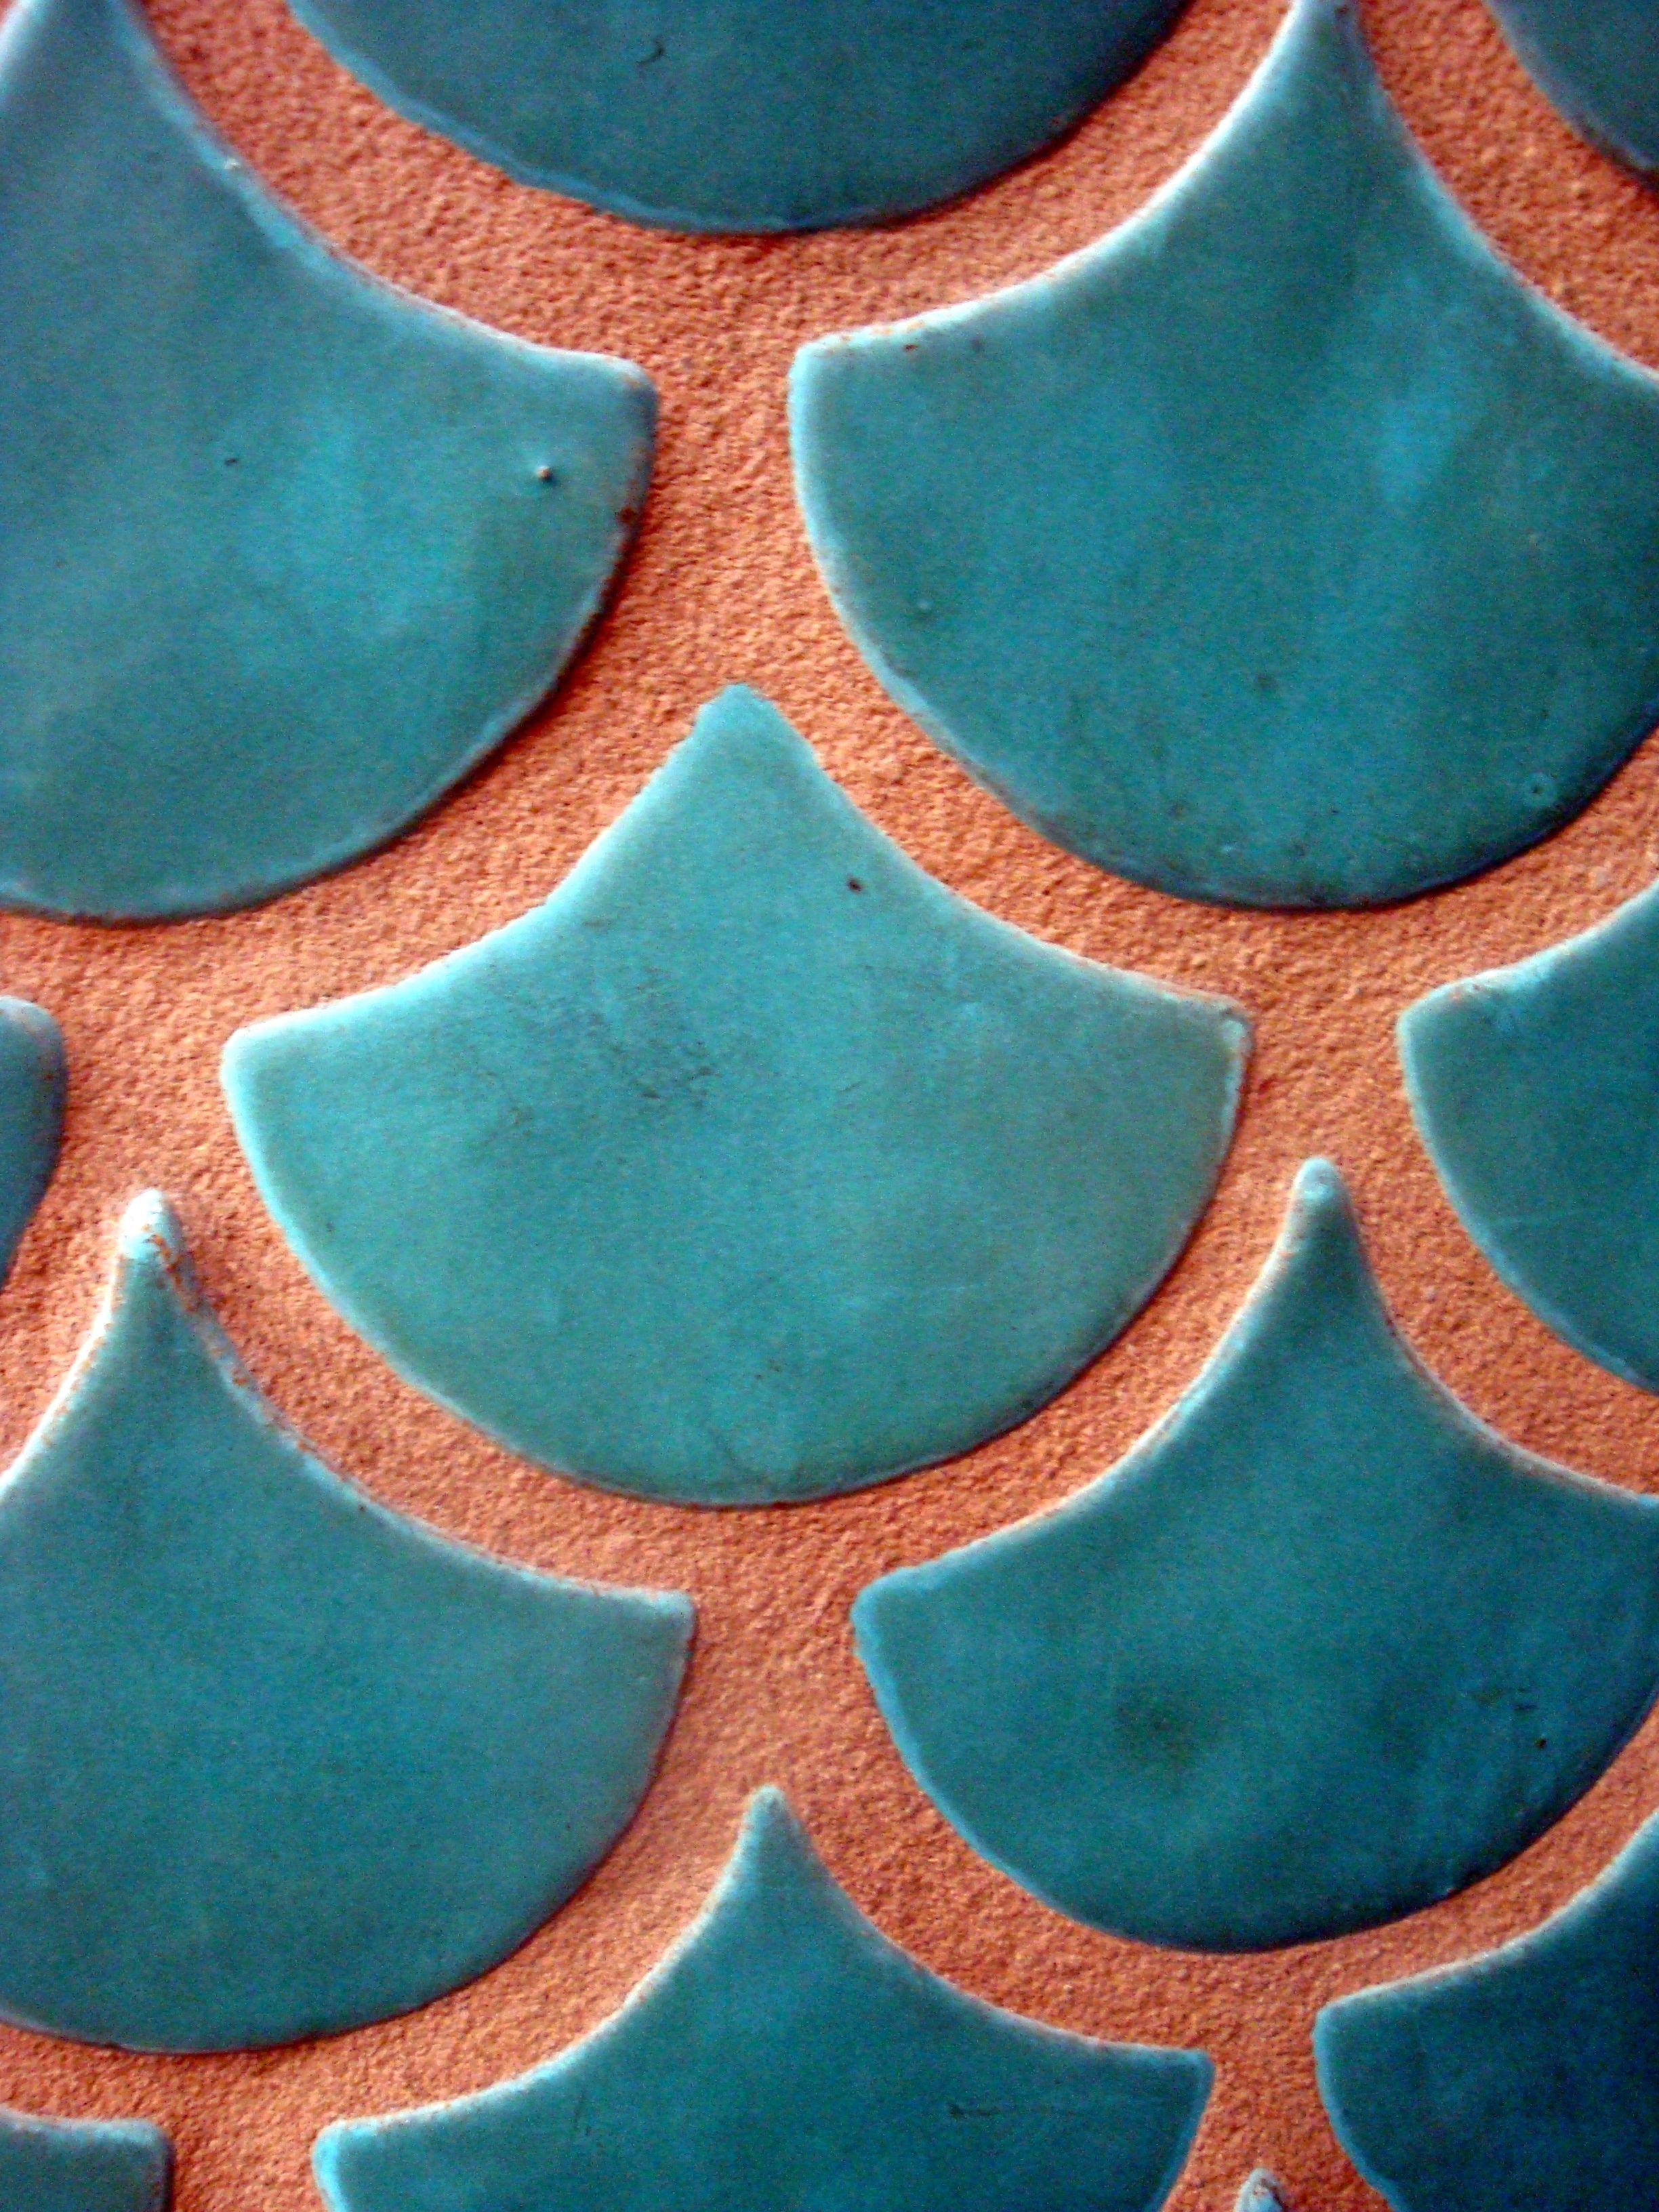 Gingko leaf tile architectureinteriors pinterest leaves gingko leaf tile backsplash dailygadgetfo Image collections